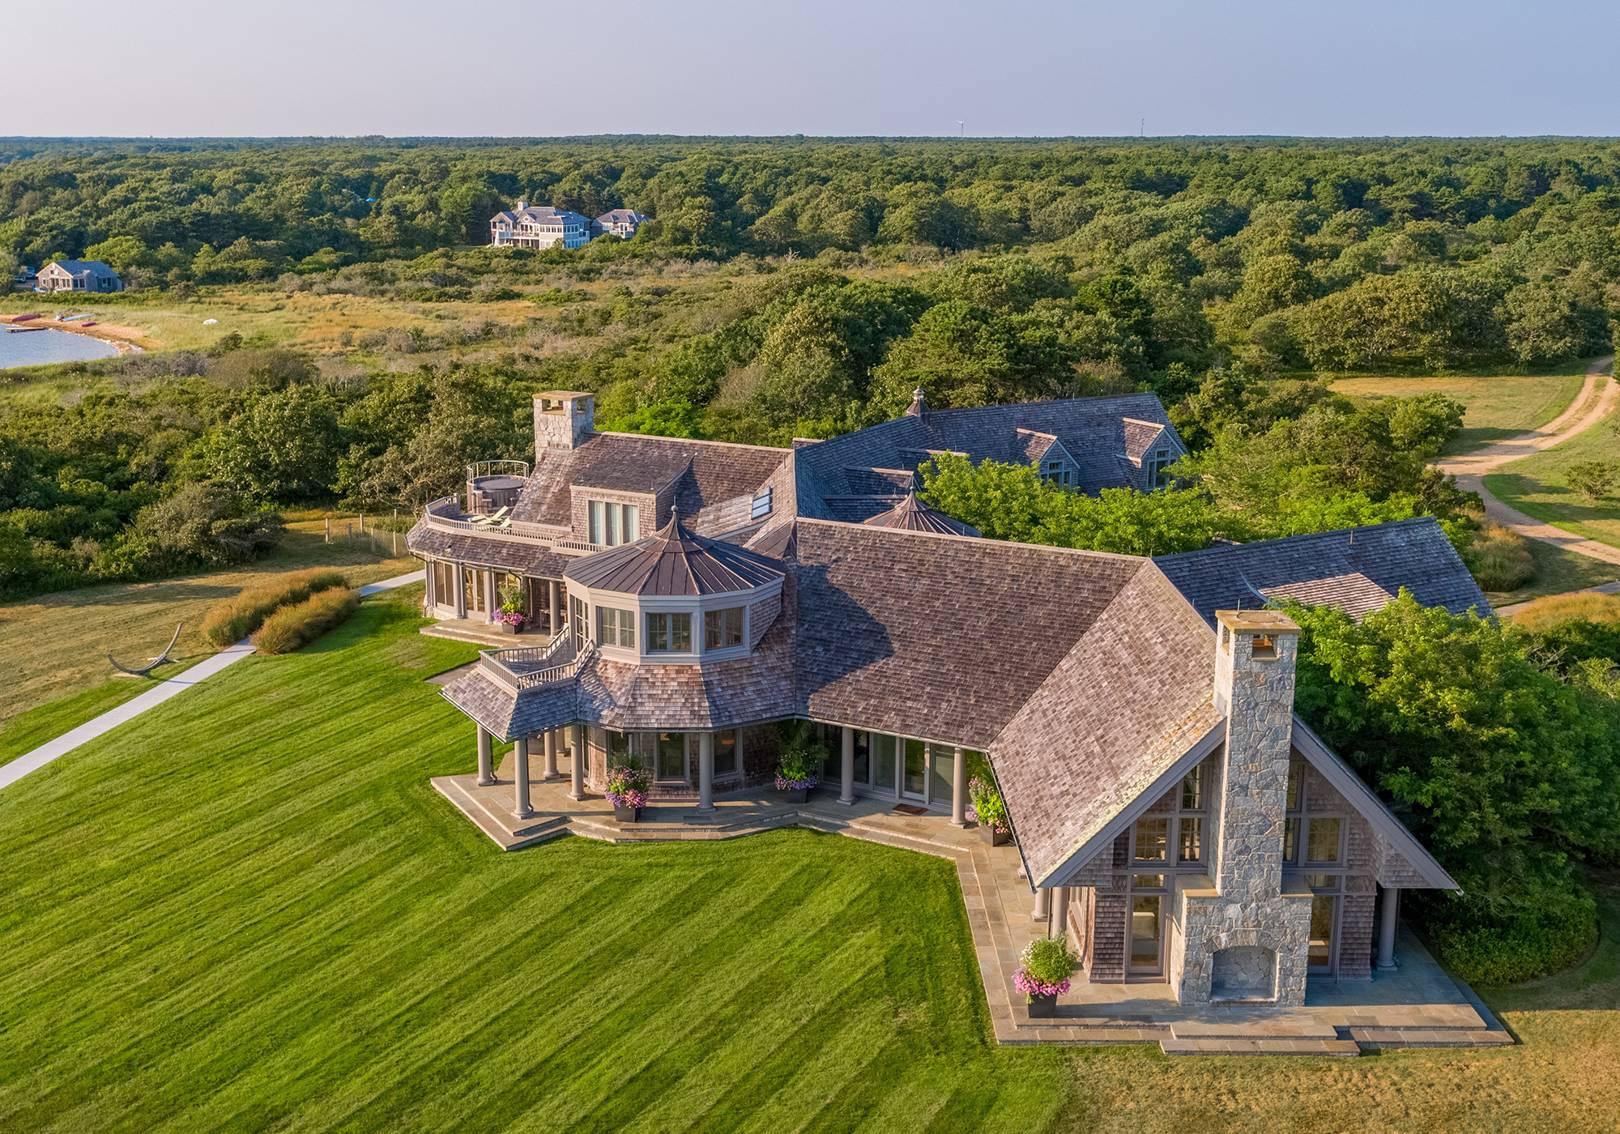 The Obamas' new house on Martha's Vineyard | House & Garden